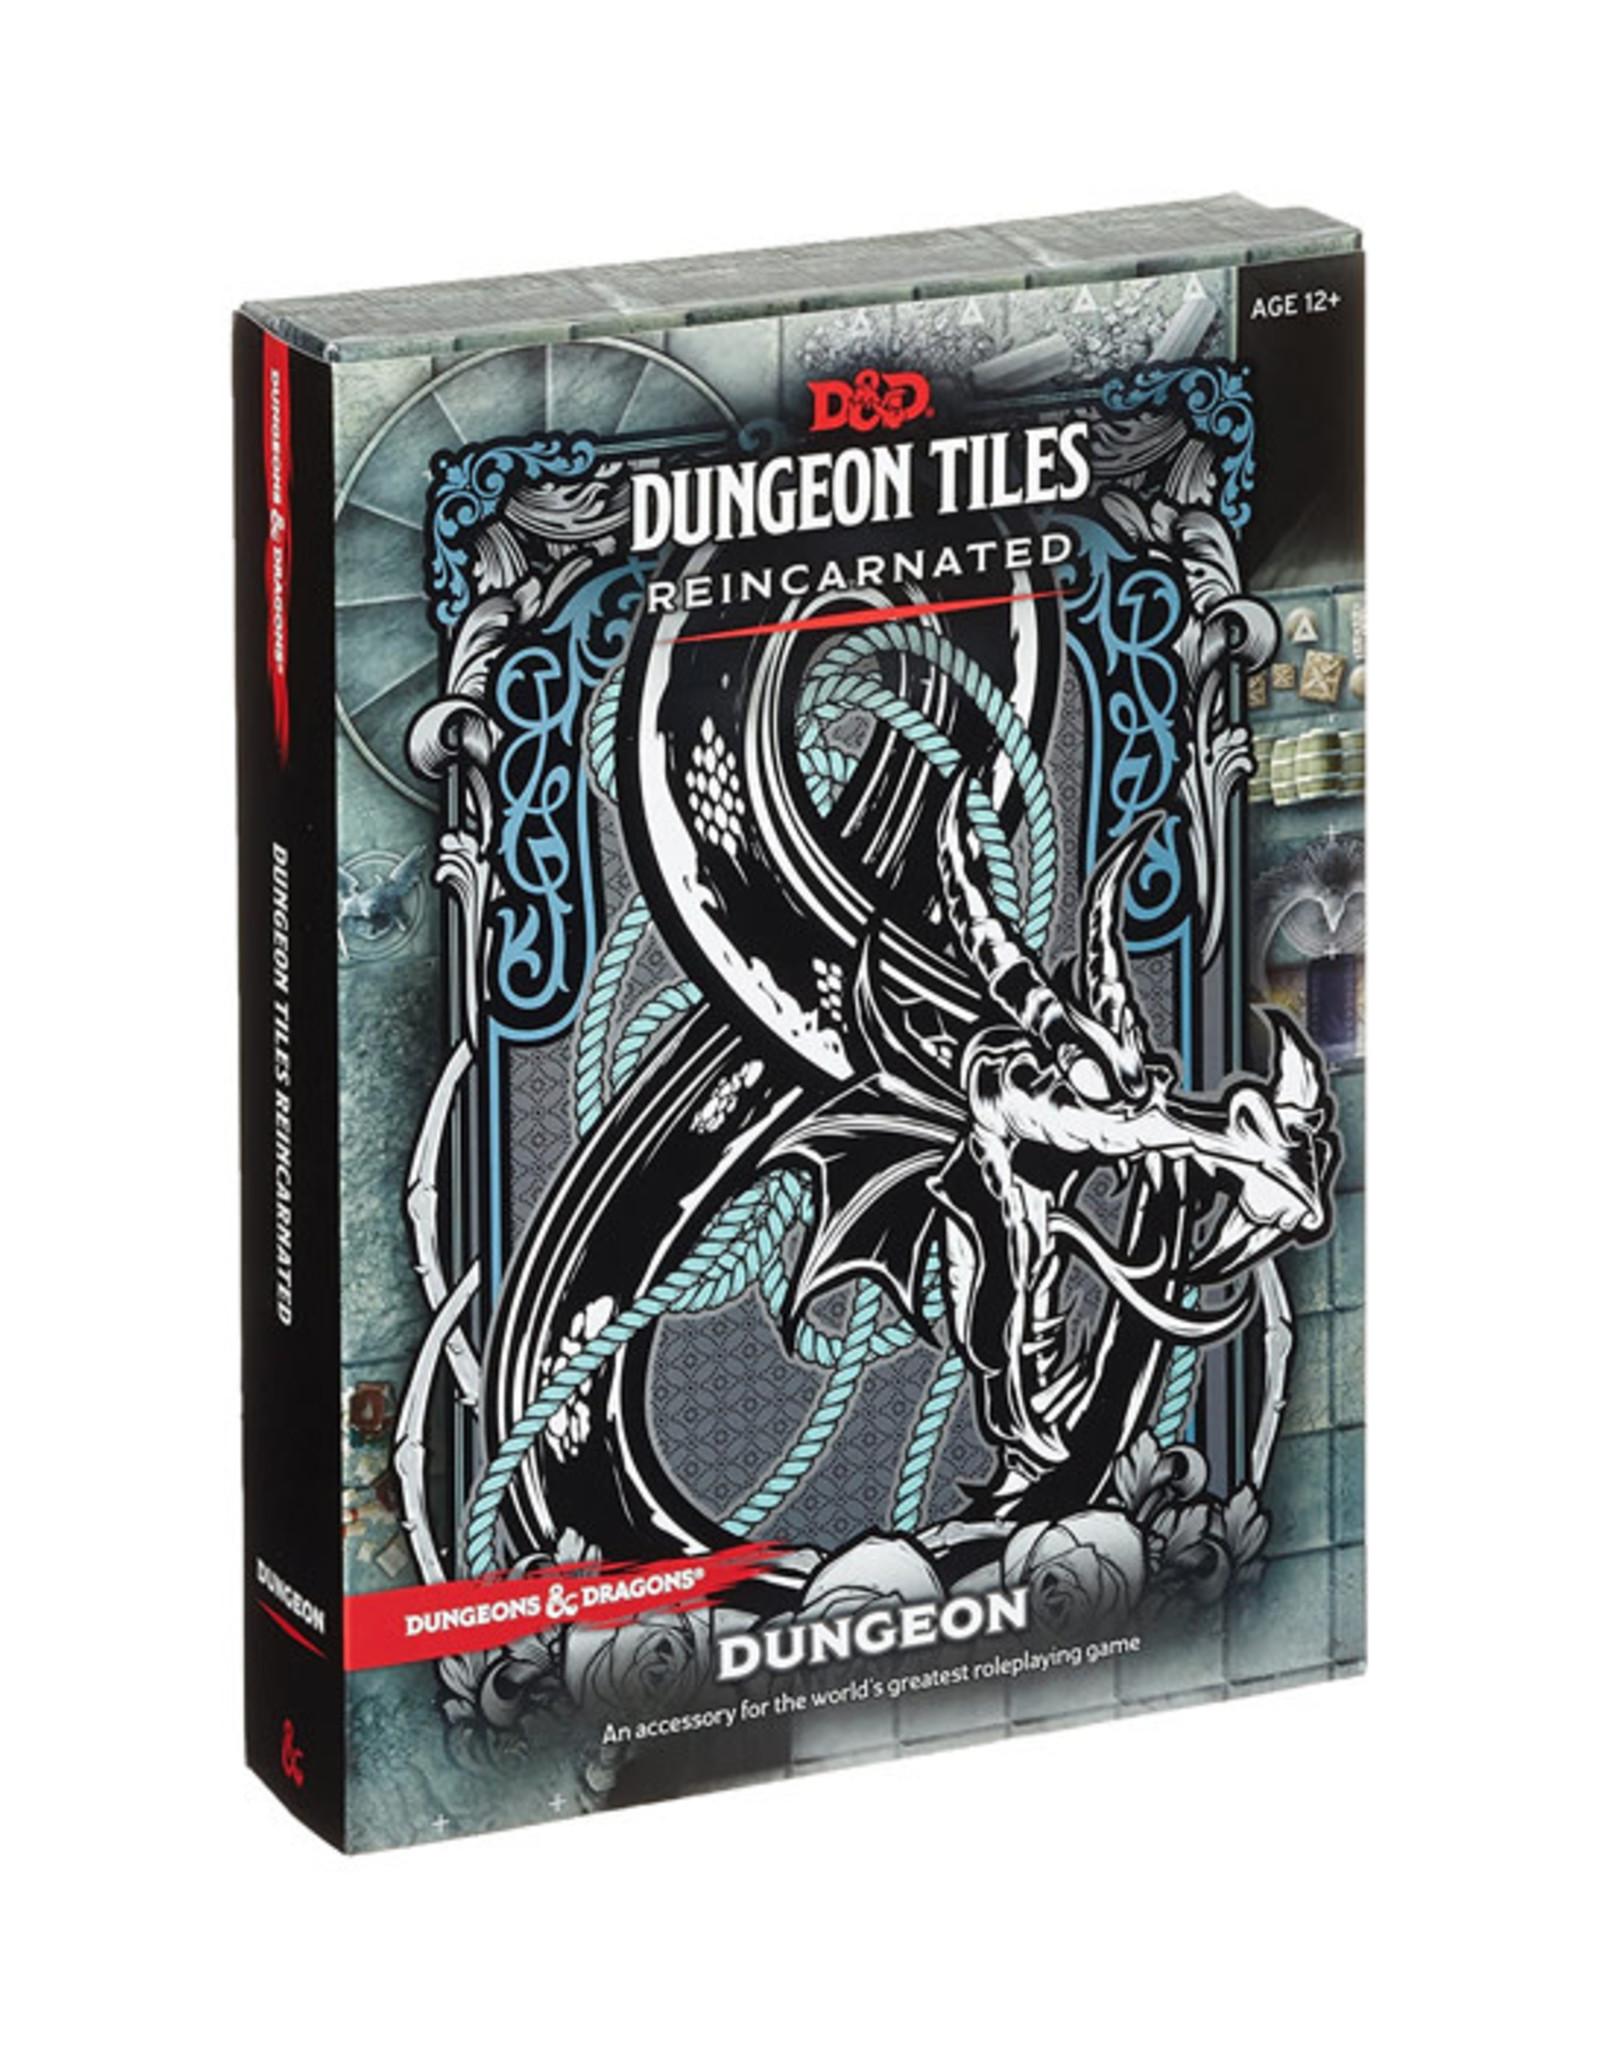 Dungeons & Dragons Dungeons & Dragons: Dungeon Tiles - Reincarnated - Dungeon